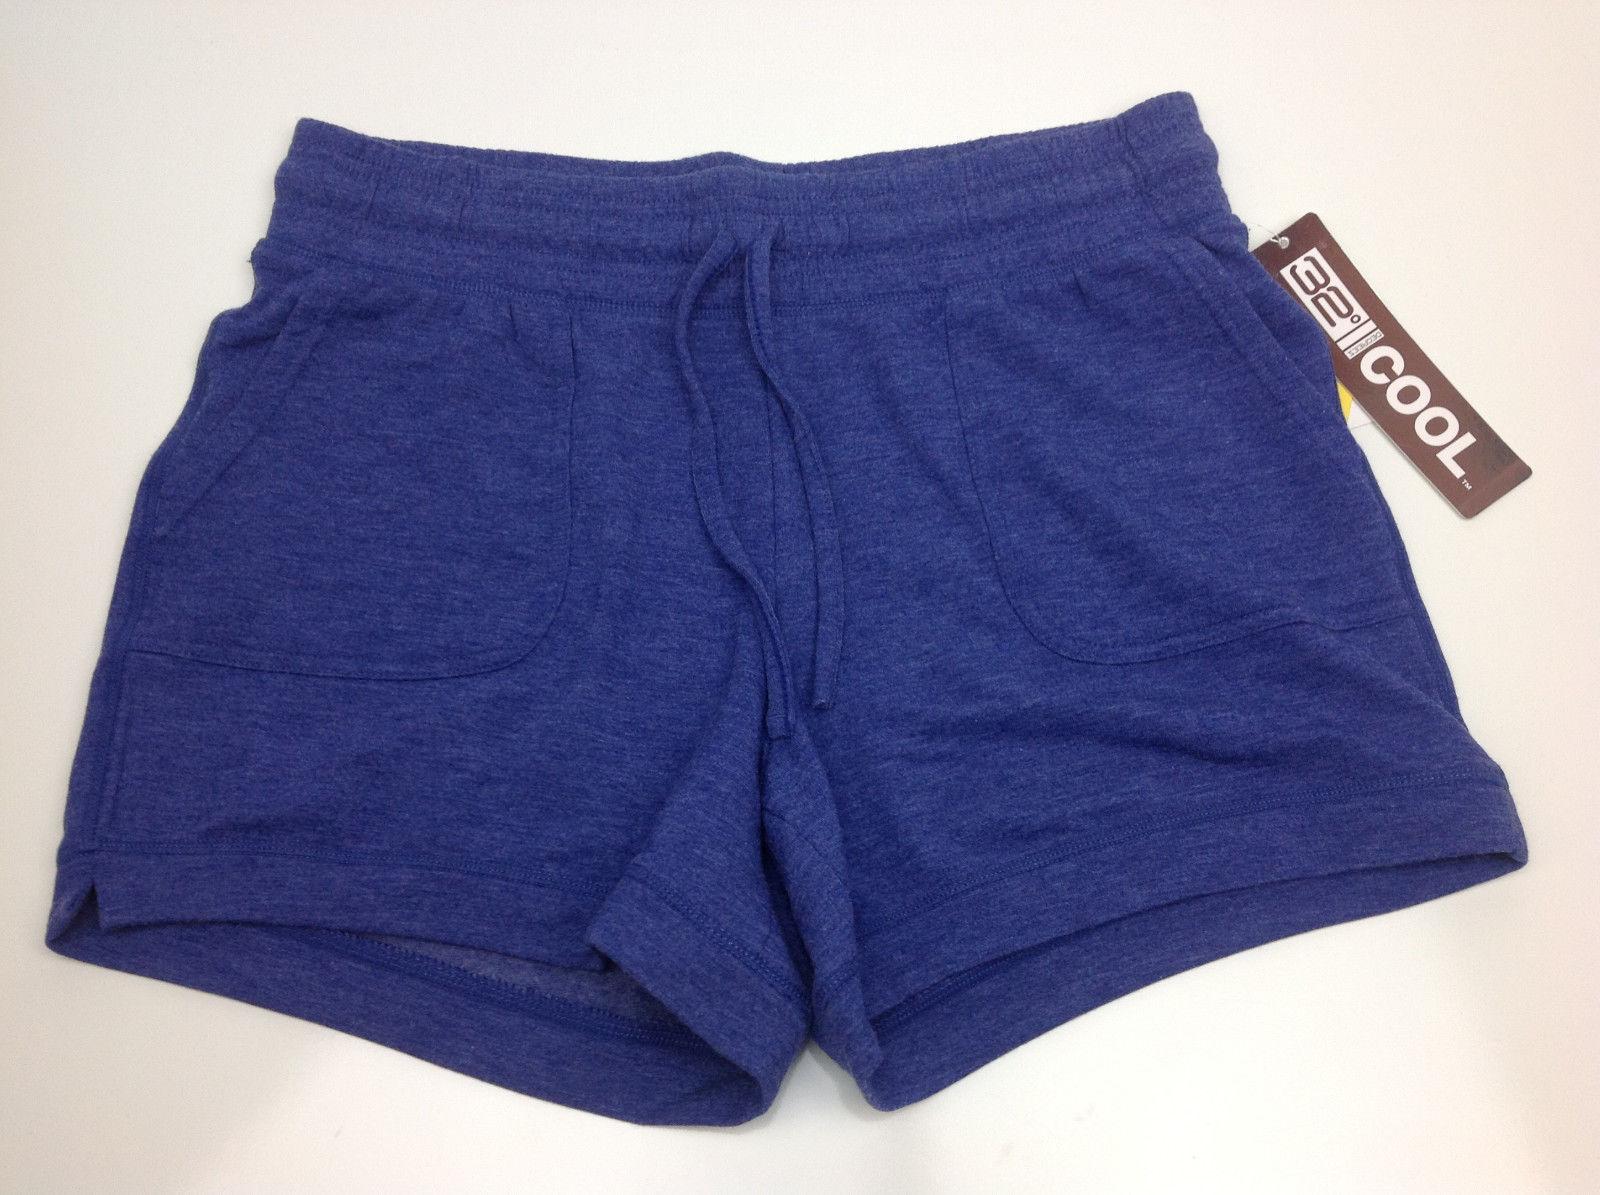 32 Degrees CoolTM Ladies' Fleece Short. image 12